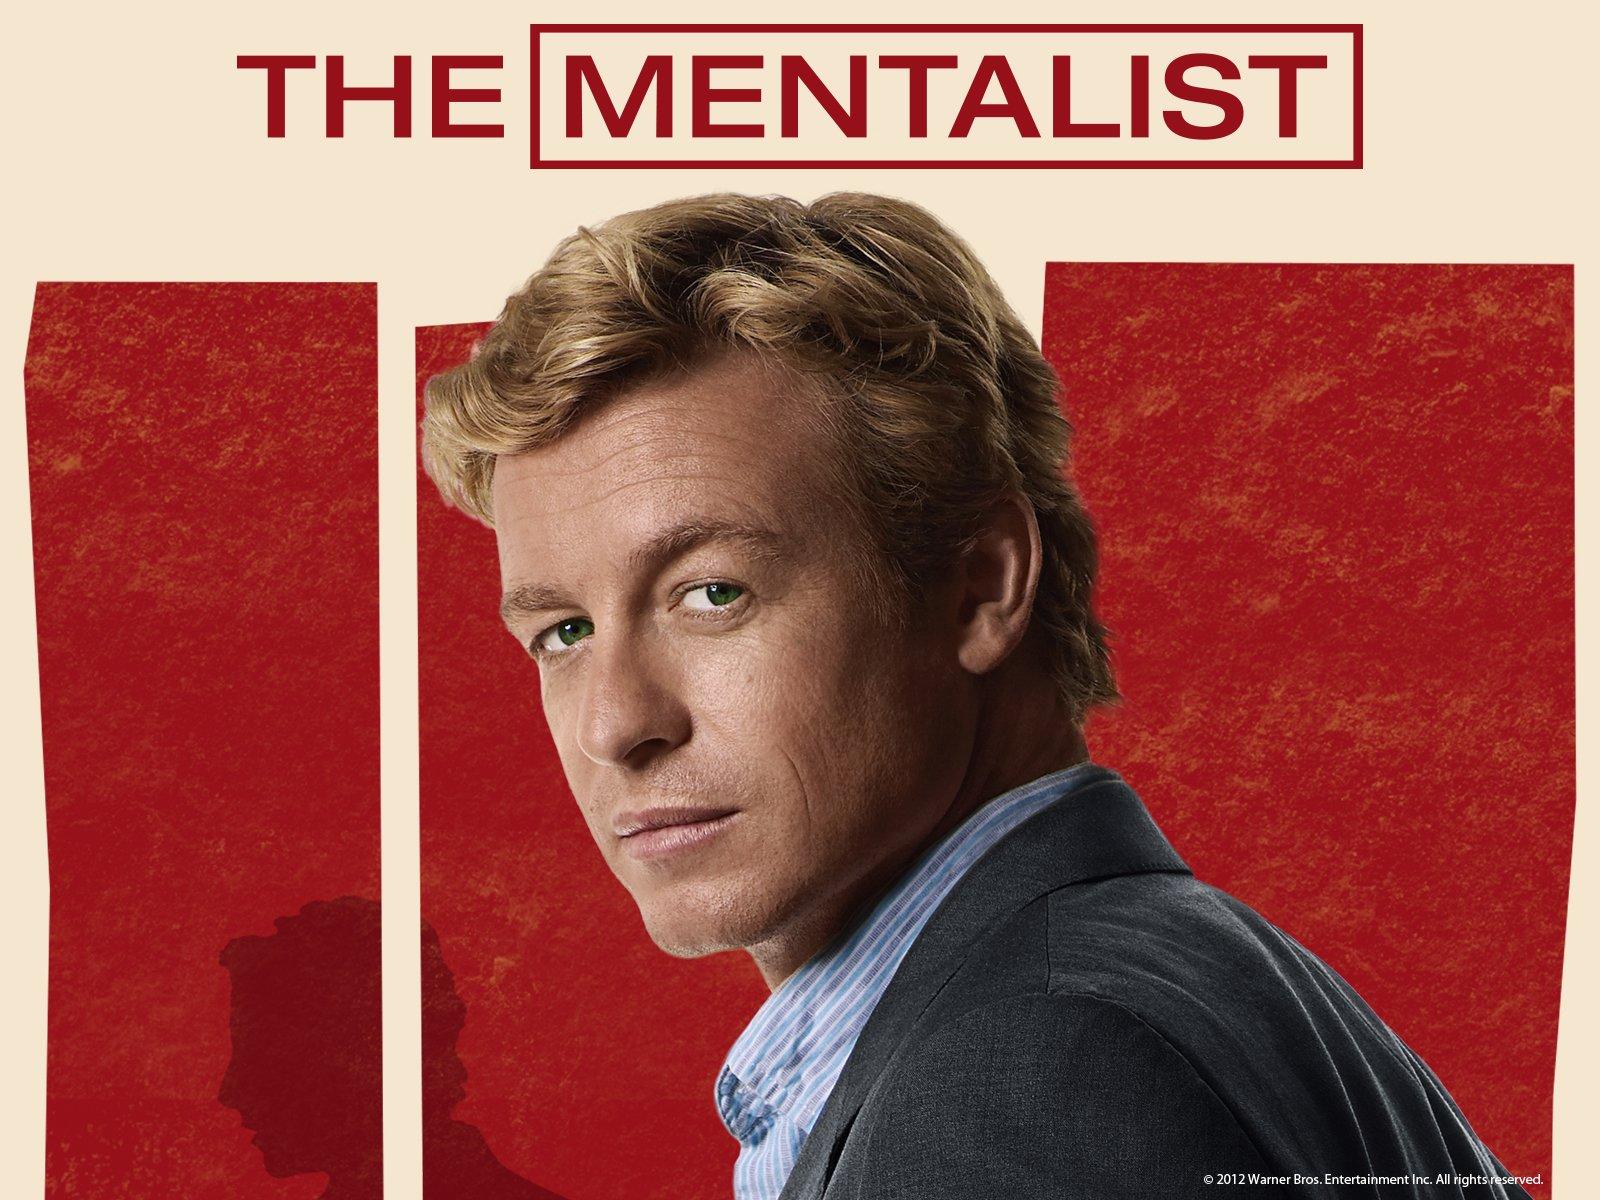 Amazon co uk: Watch The Mentalist - Season 2 | Prime Video